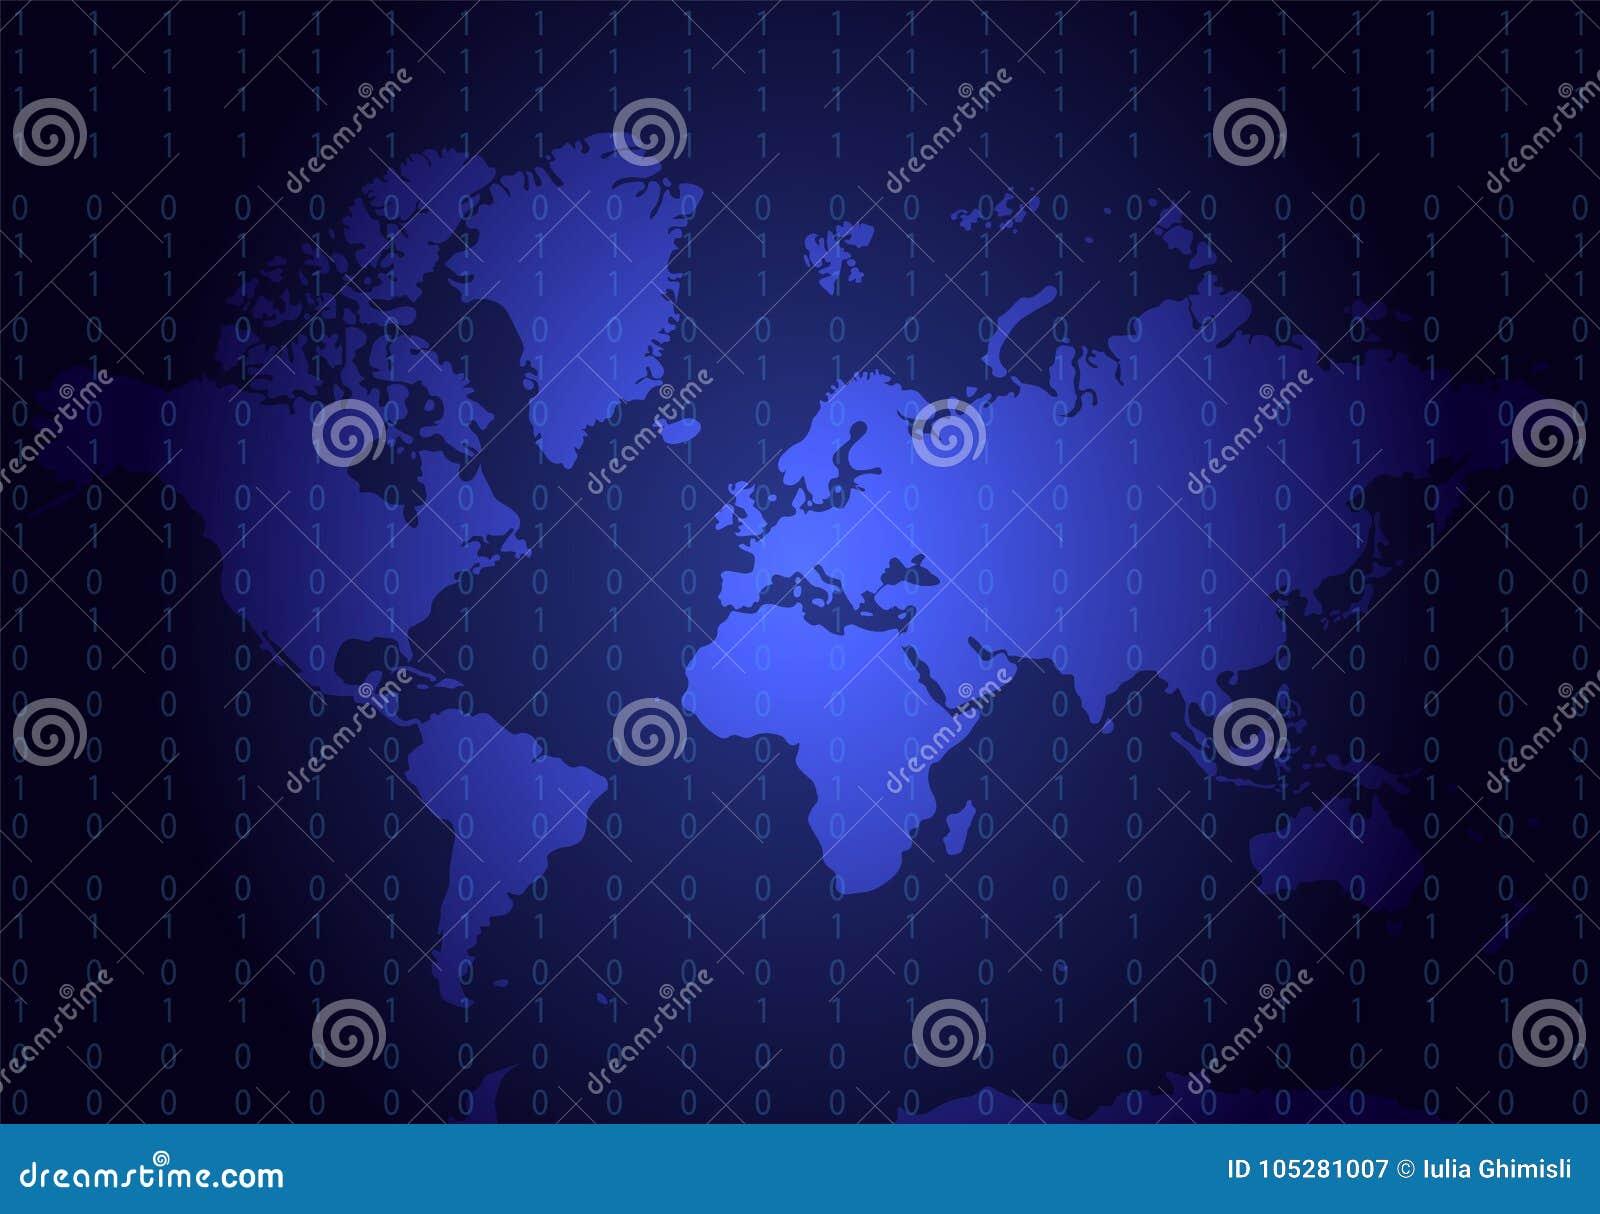 Mapa geográfico azul con números de código Todos los continentes: Asia, E